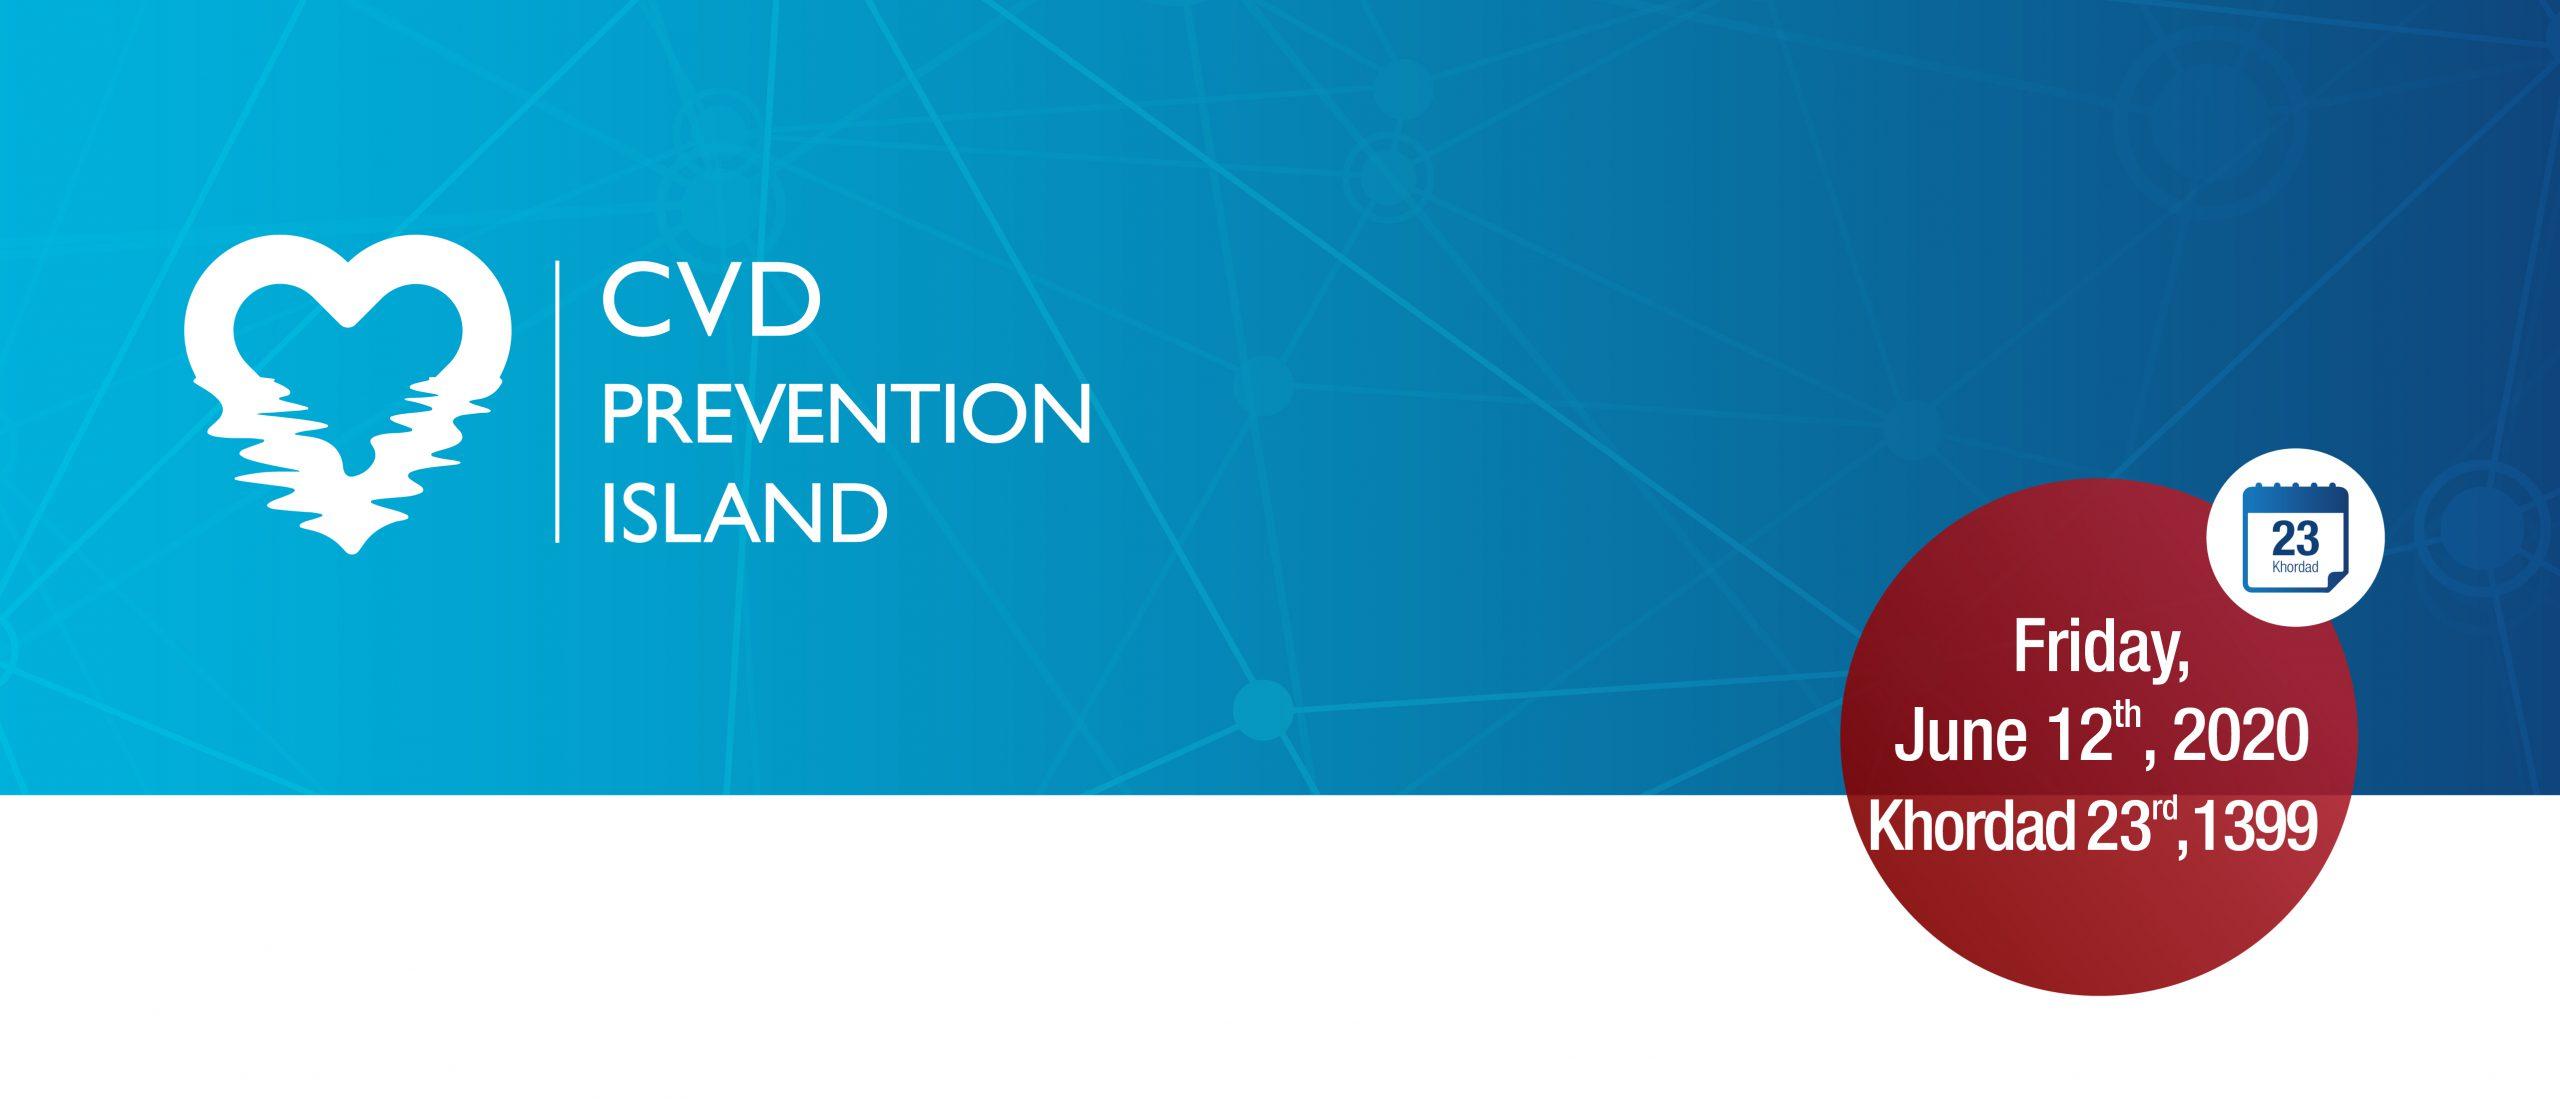 CVD Prevention Island